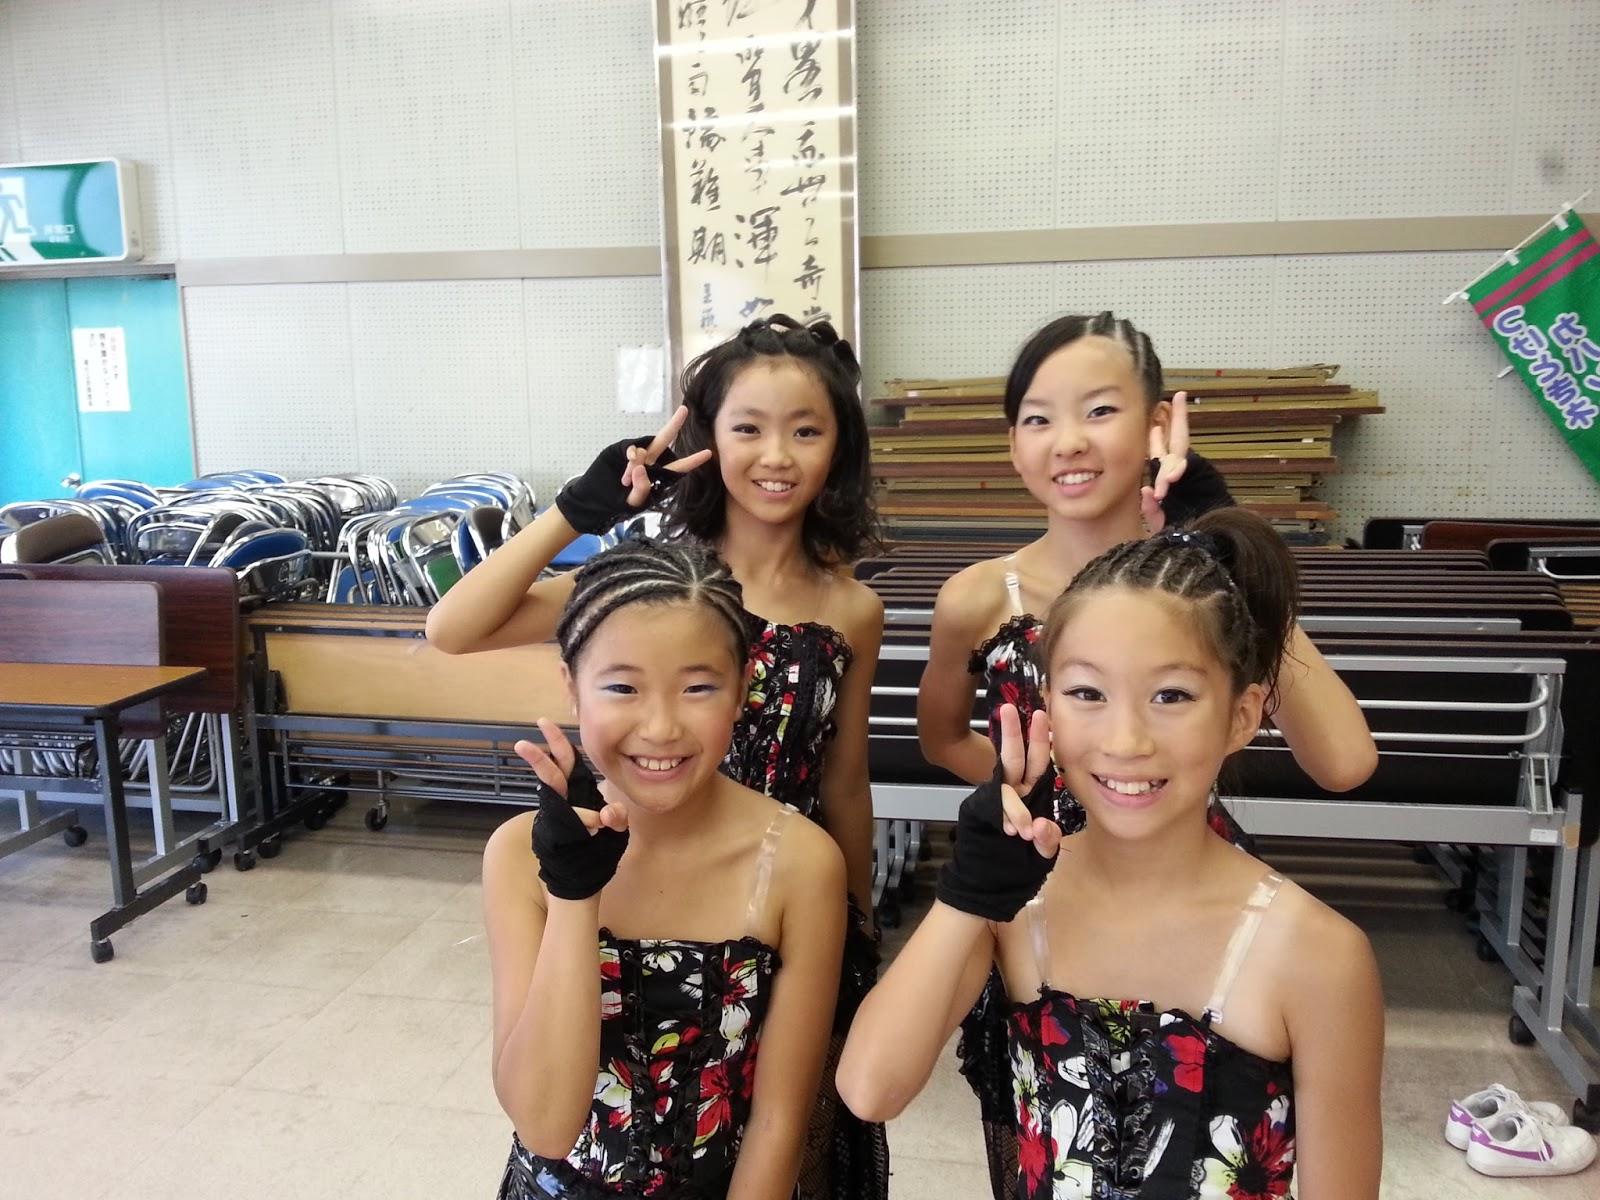 【JS】女子小学生 高学年画像スレPart9【JS】YouTube動画>10本 ->画像>698枚